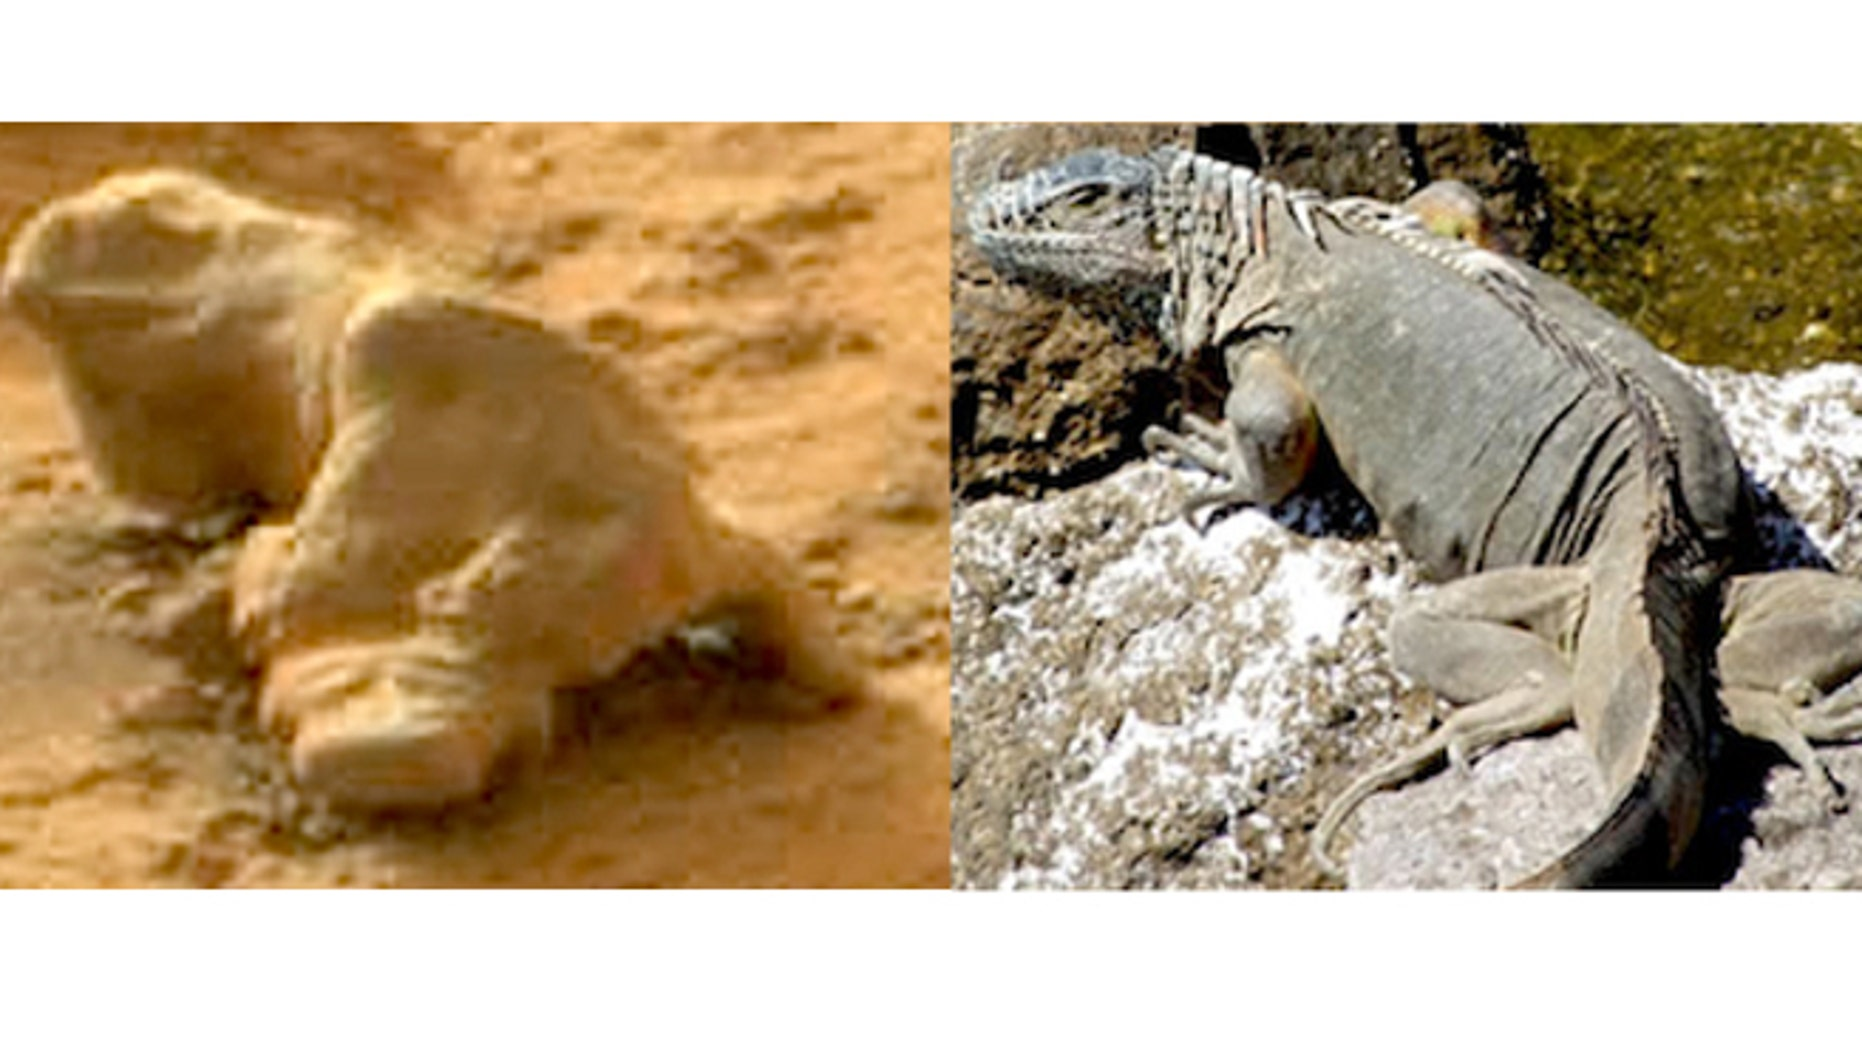 A rock found on Mars resembles an iguana.